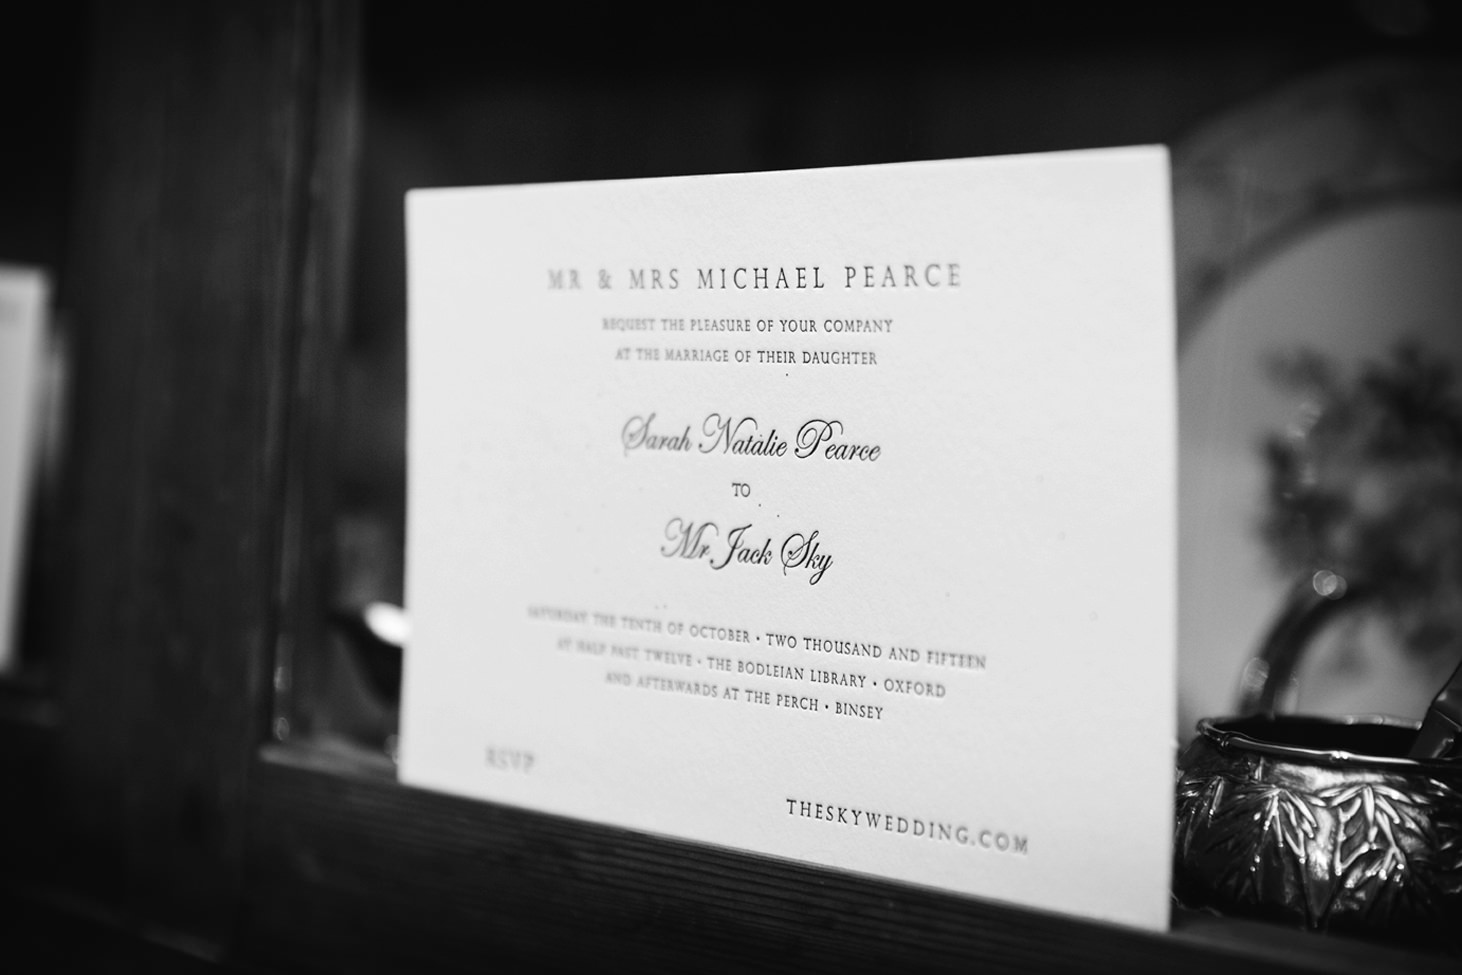 Bodleian library wedding invitation